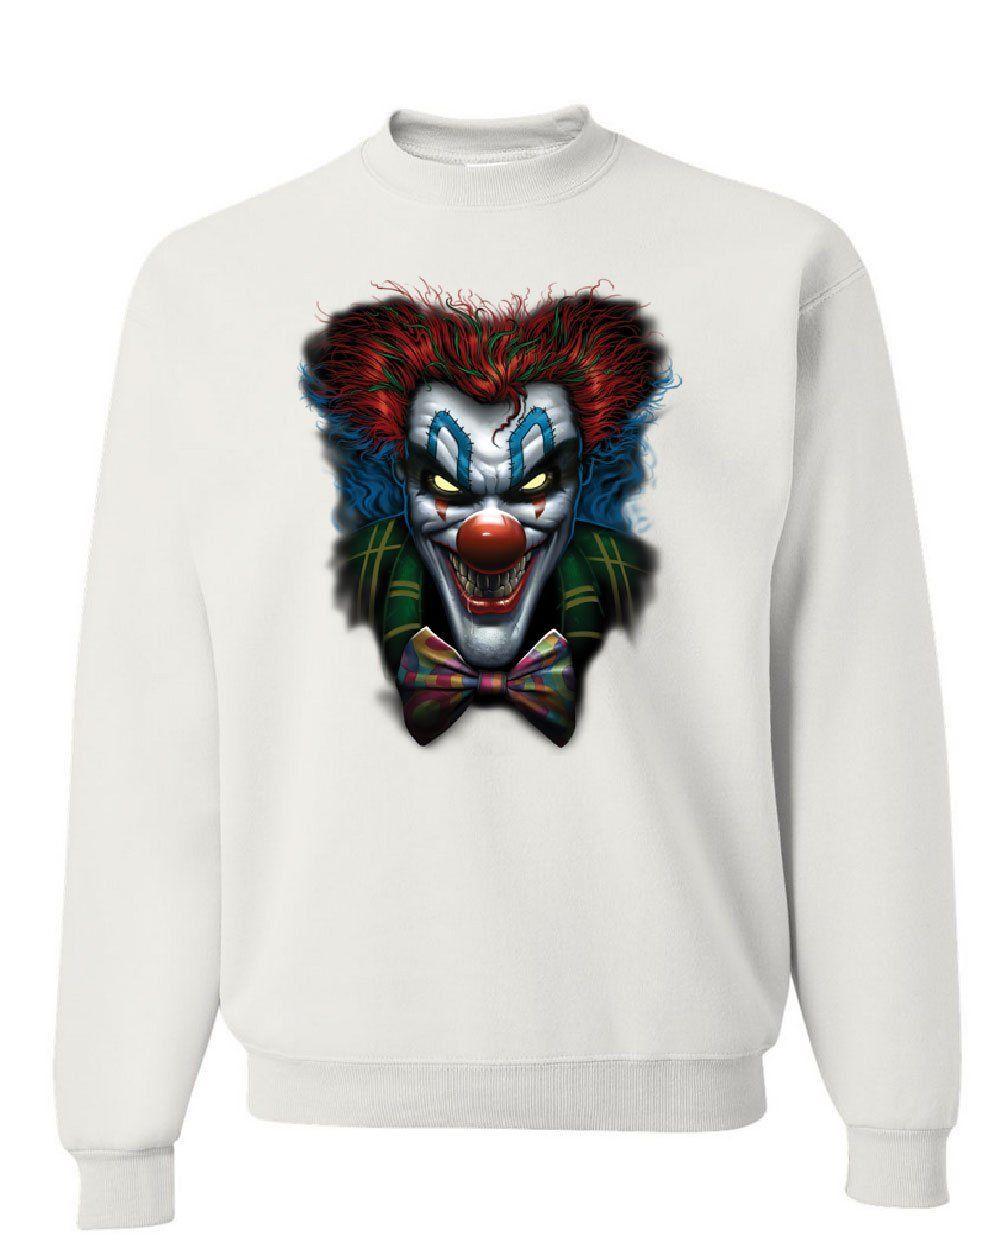 Psycho Clown Sweatshirt Nightmare Evil Creepy Scary Horror Fobia Sweater